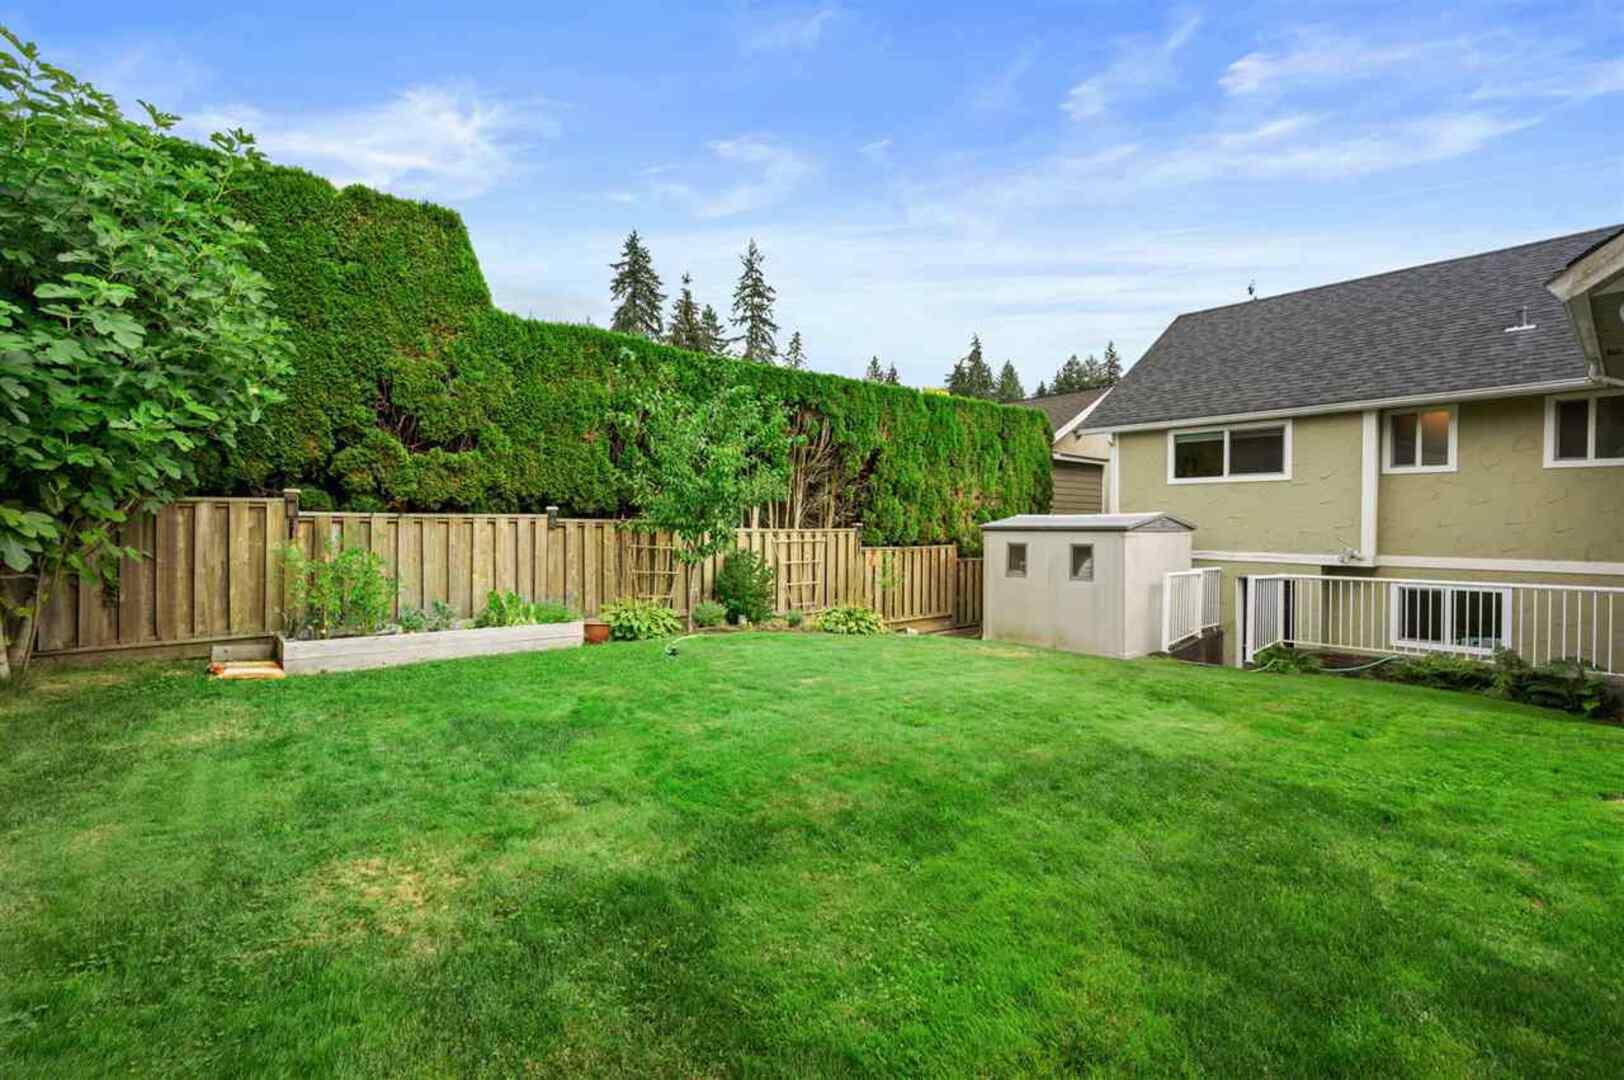 2808-trillium-place-blueridge-nv-north-vancouver-36 at 2808 Trillium Place, Blueridge NV, North Vancouver